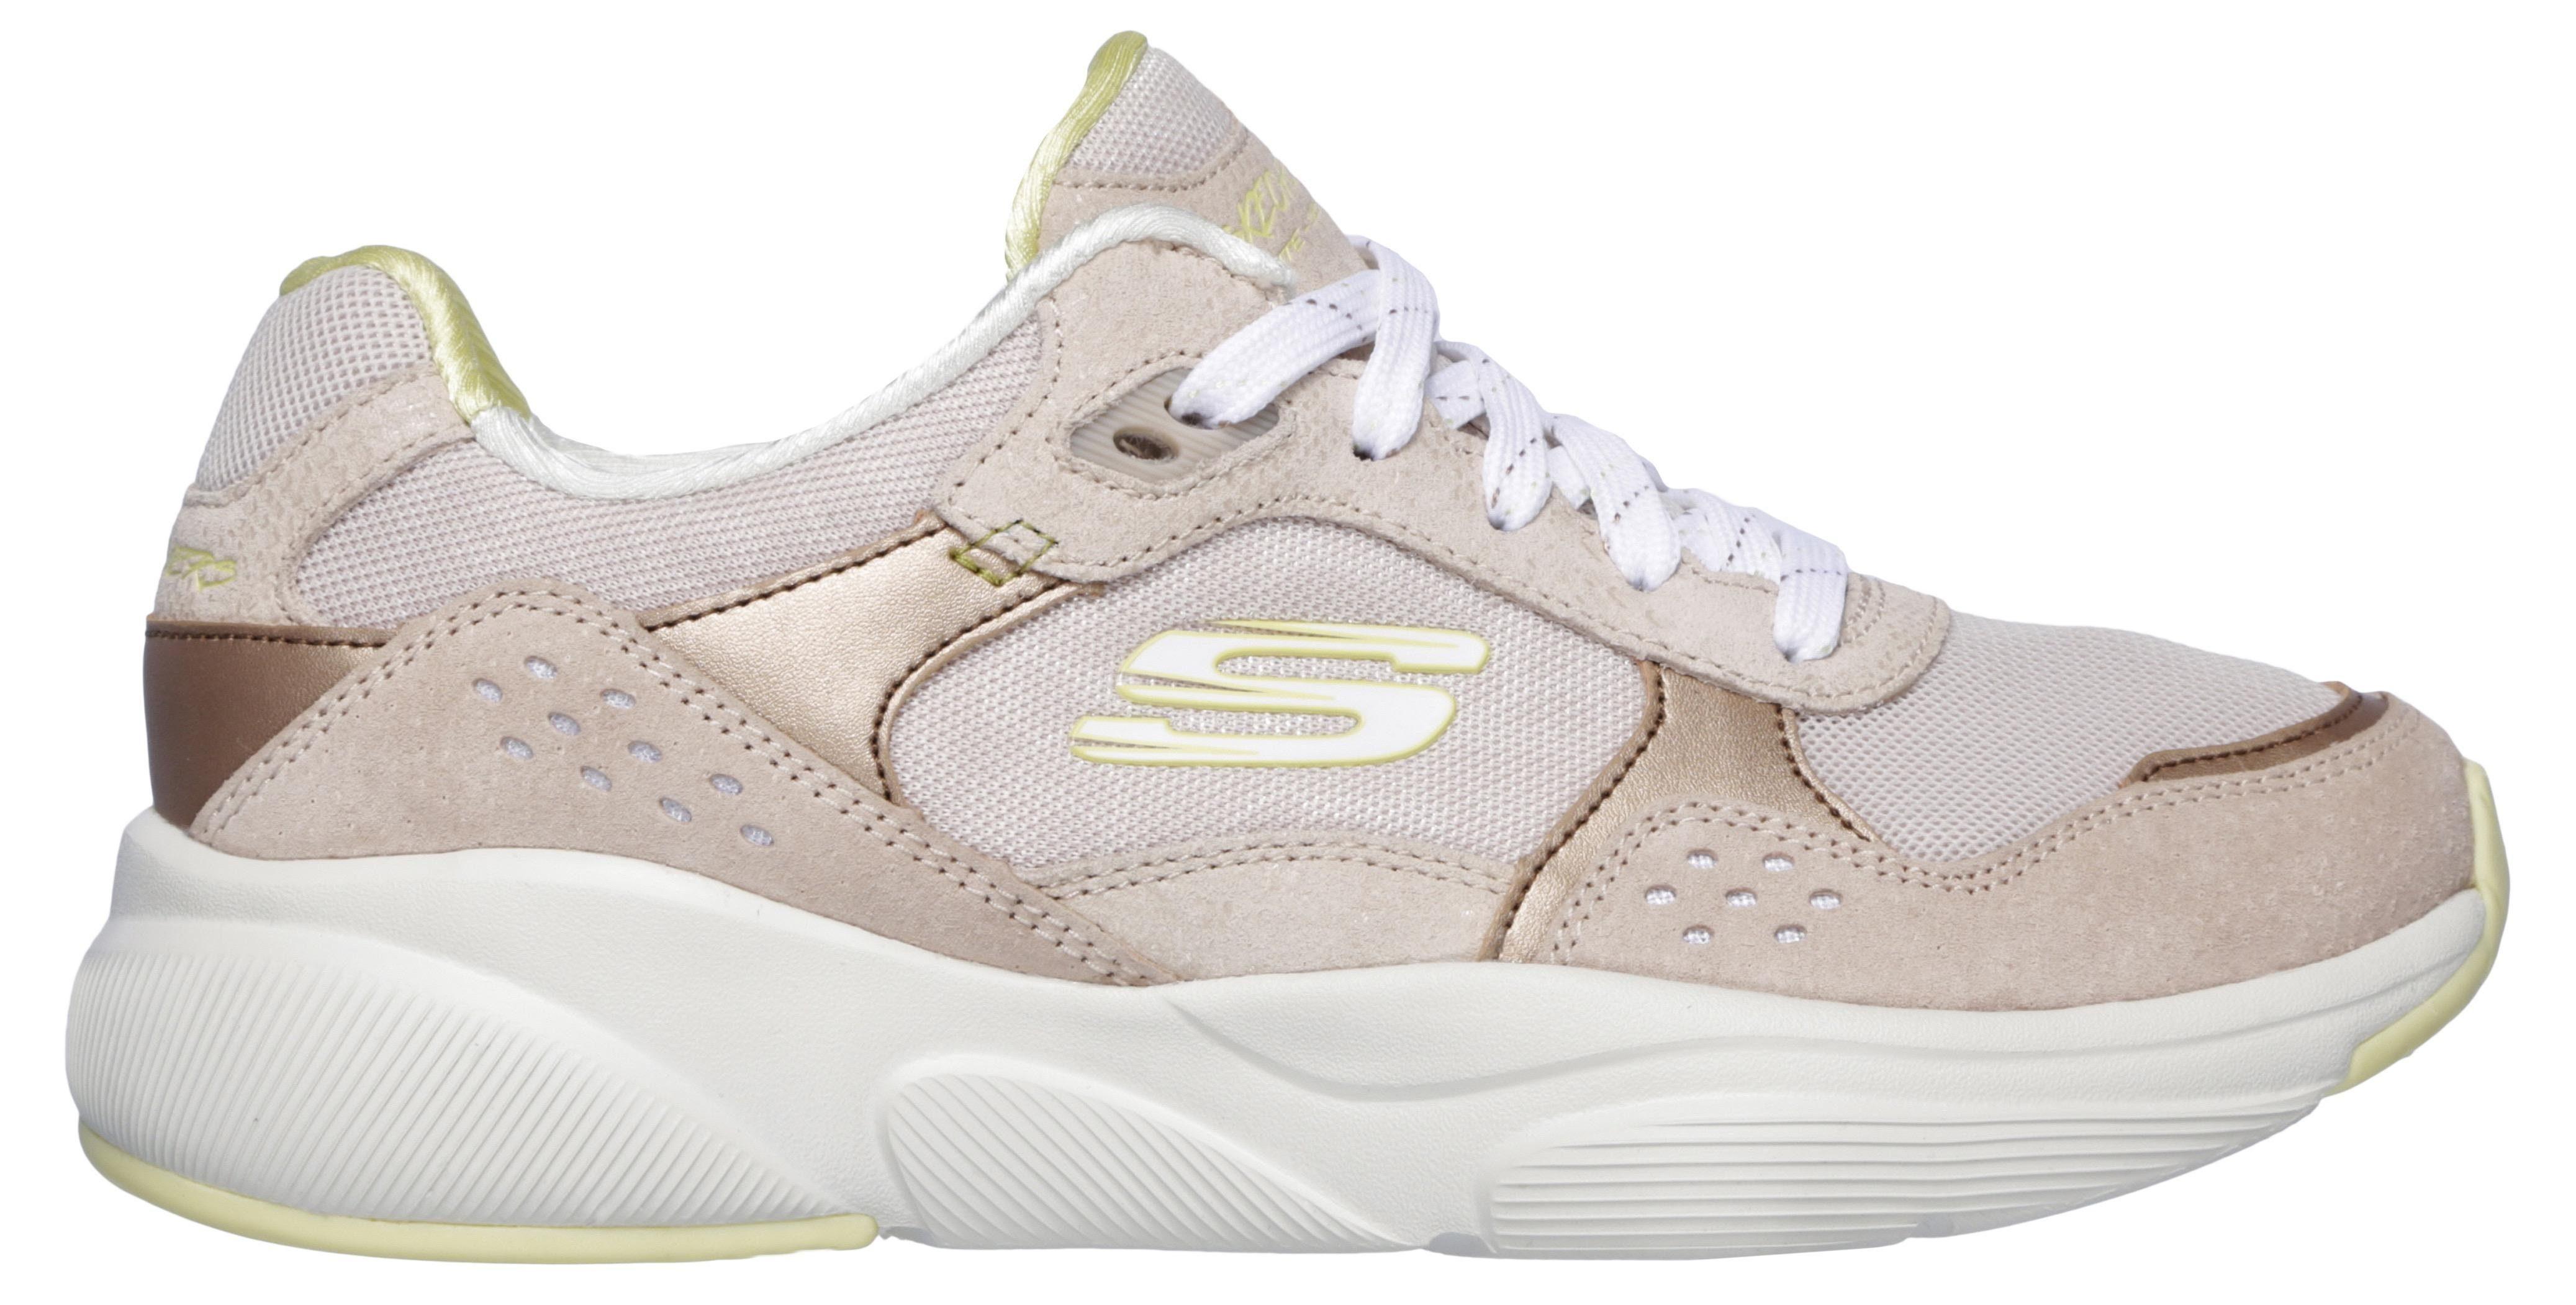 Skechers »Meridian No Worries« Sneaker in toller Farbkombi